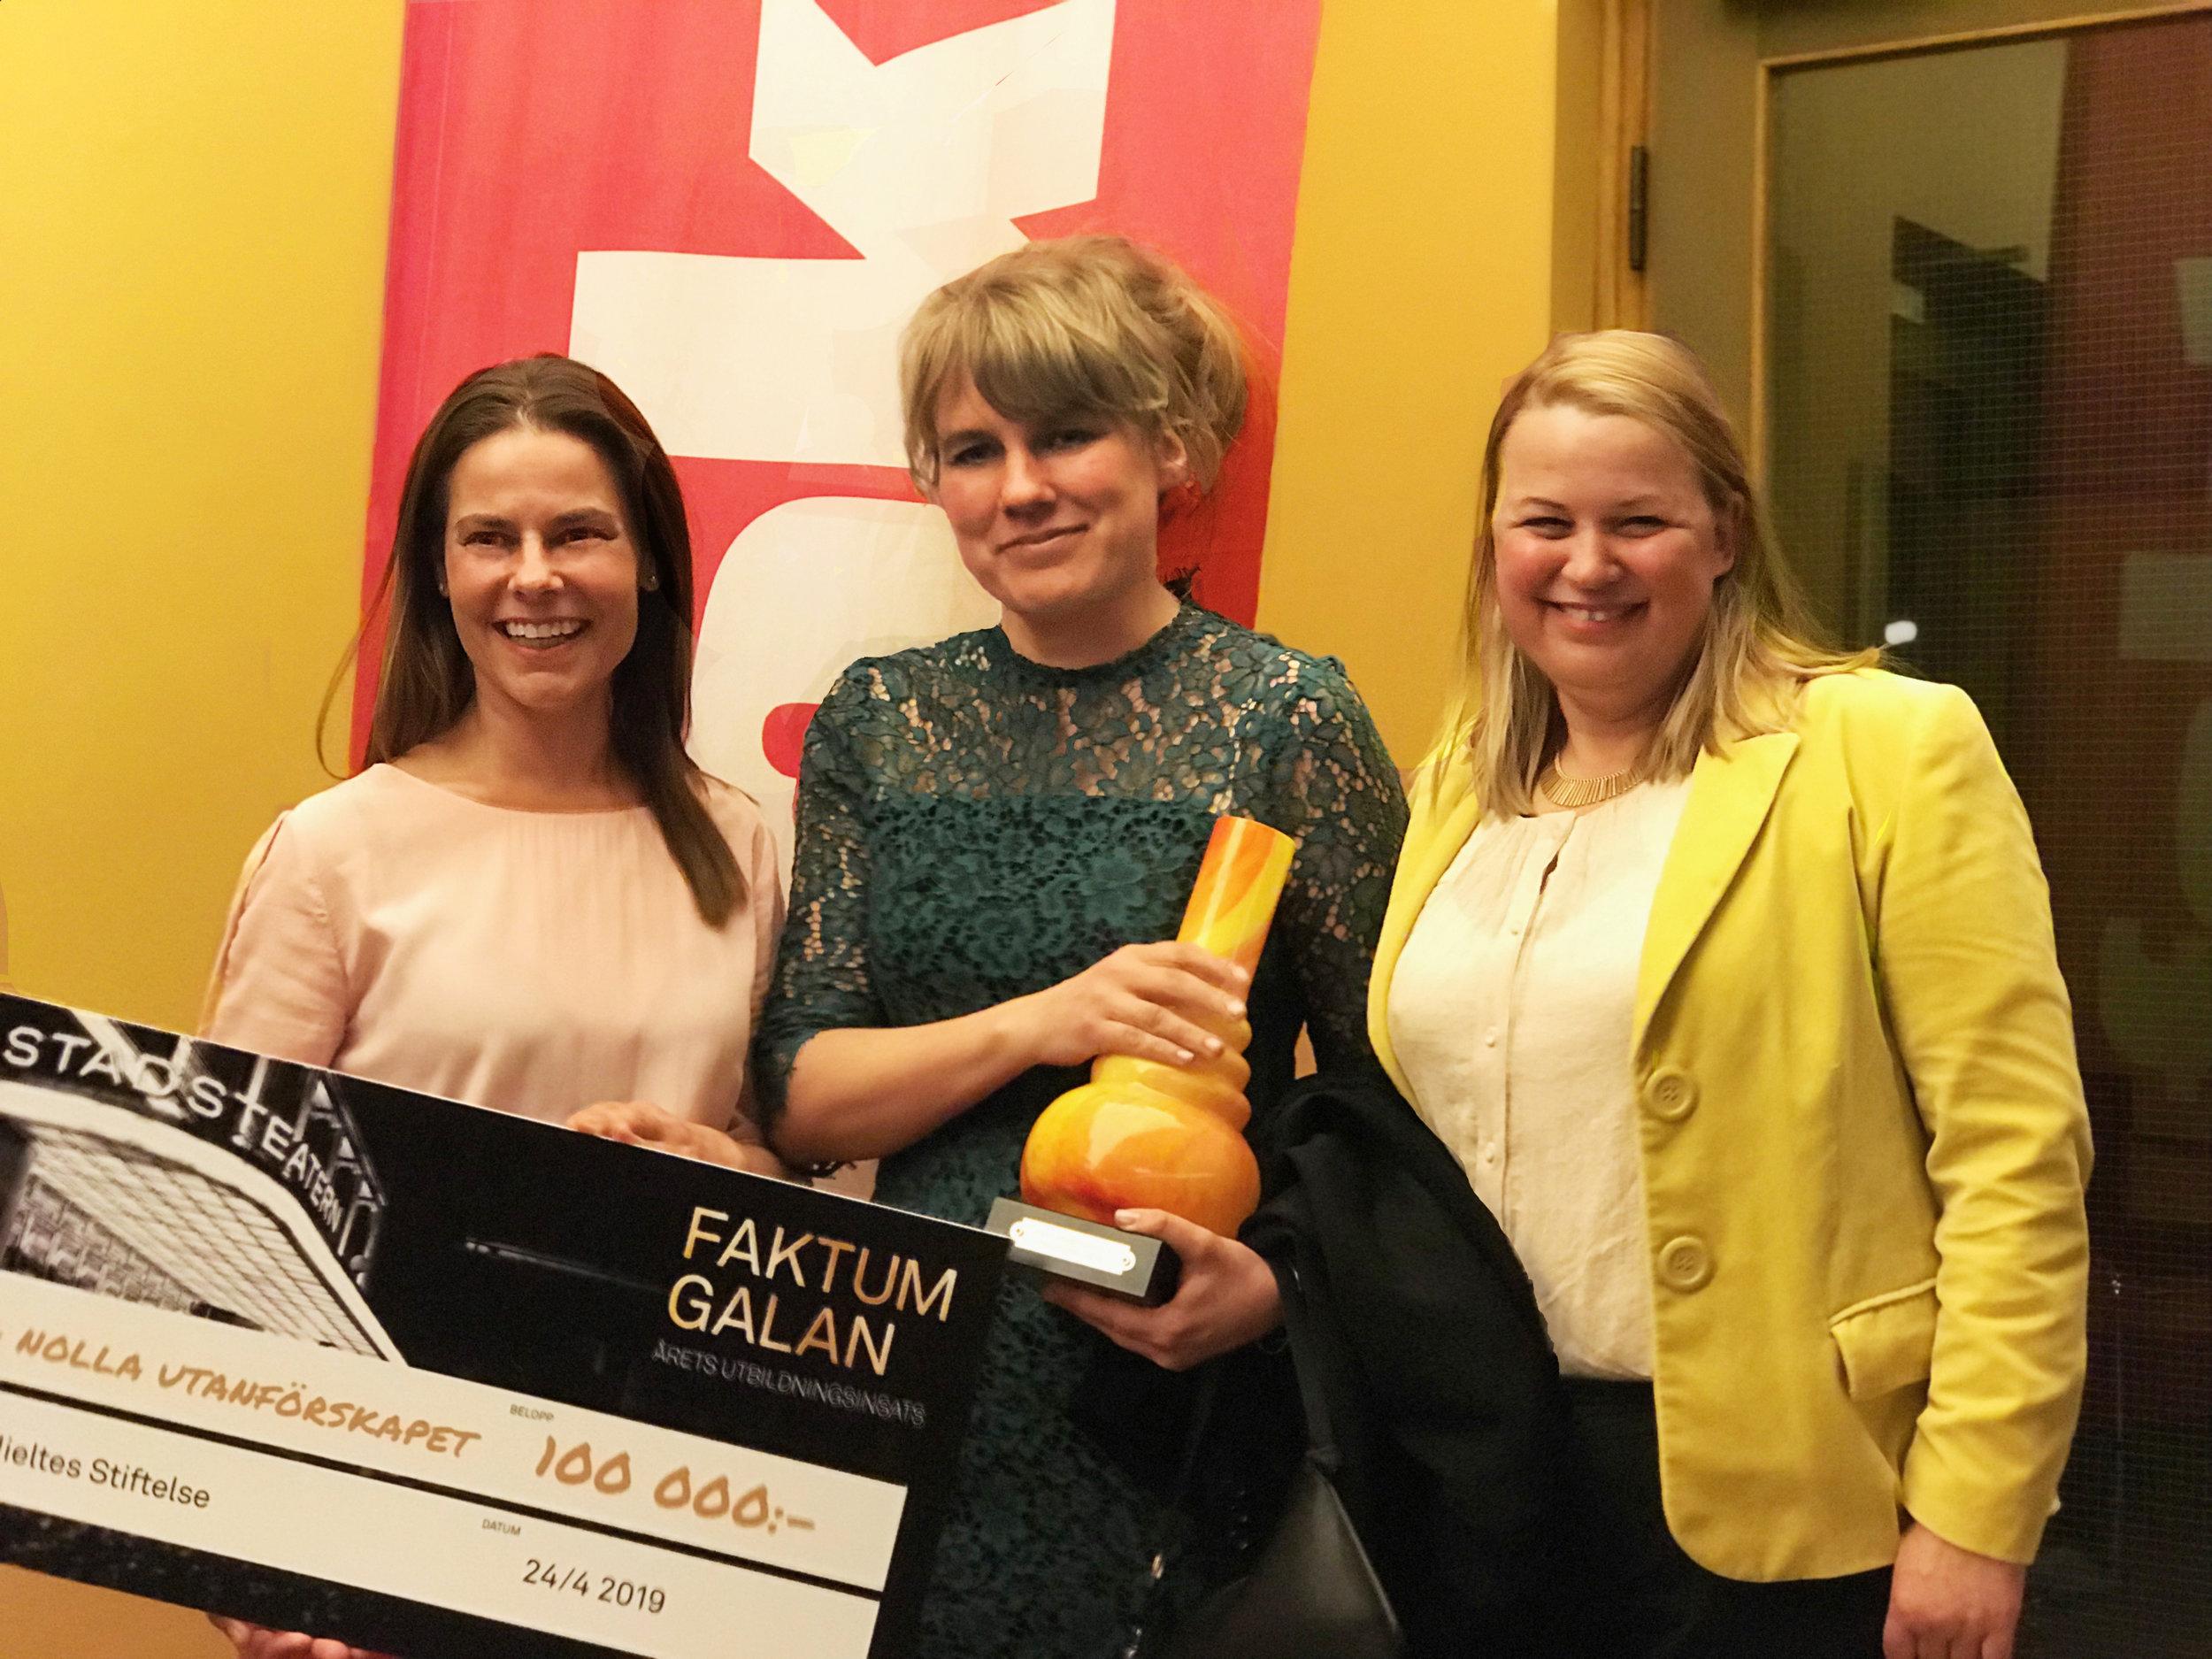 Sanna Wolk Katja Halvarsson Wanda Throne-Holst Faktumgalan 2019